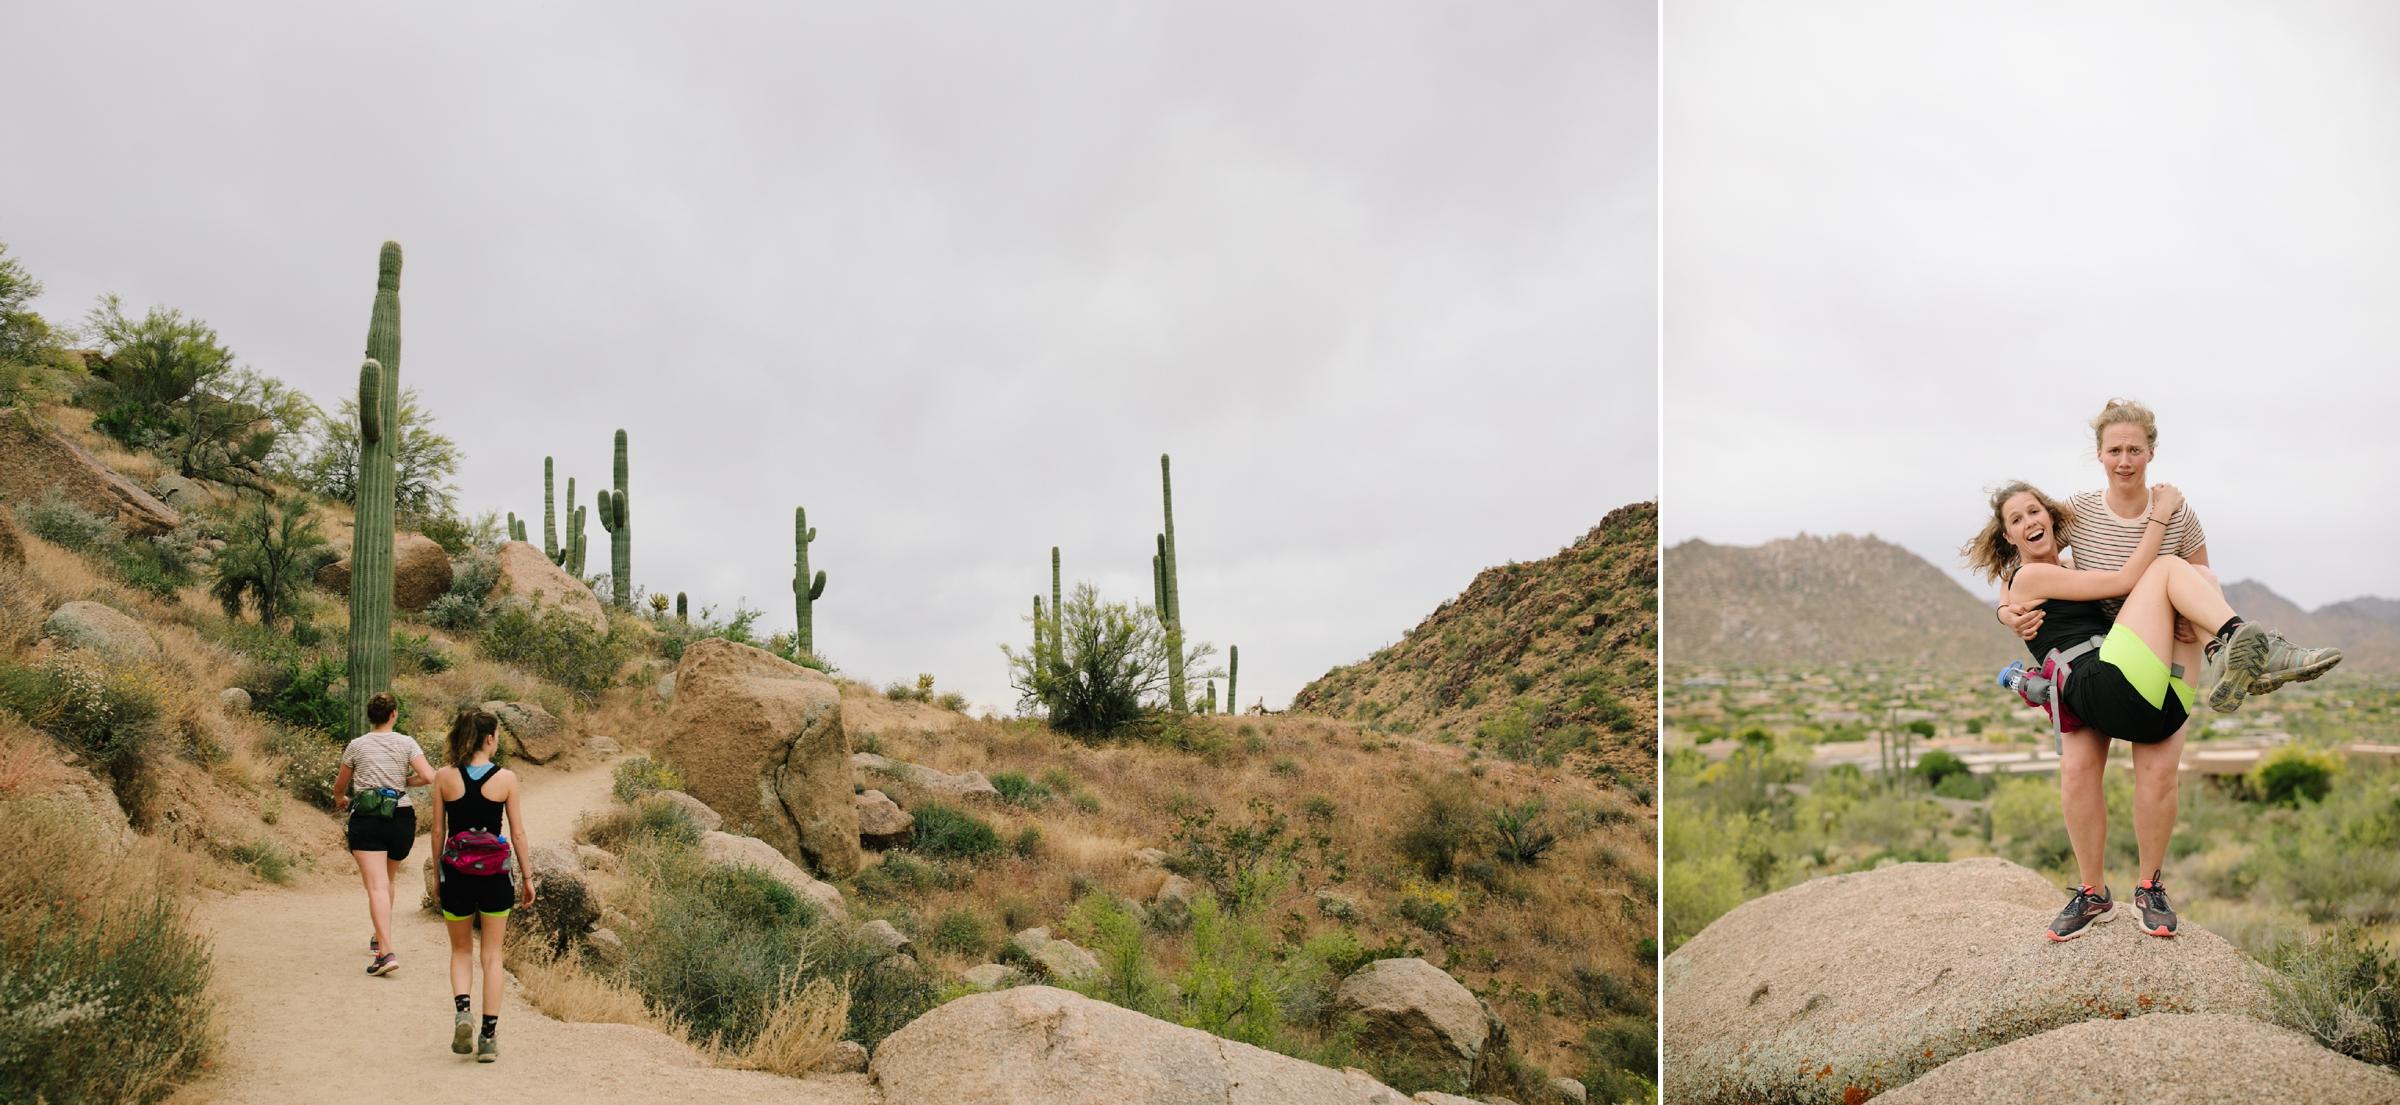 catie-bergman-arizona-southwest-hipster-seattlefamily-seattle-family-pnw-first-birthday-lifestylephotography-catie-bergman-photography-elopement-landscape-travel-wedding-pnw-portrait-lifestylephotography-vsco-northwest-friends-love_0006.jpg